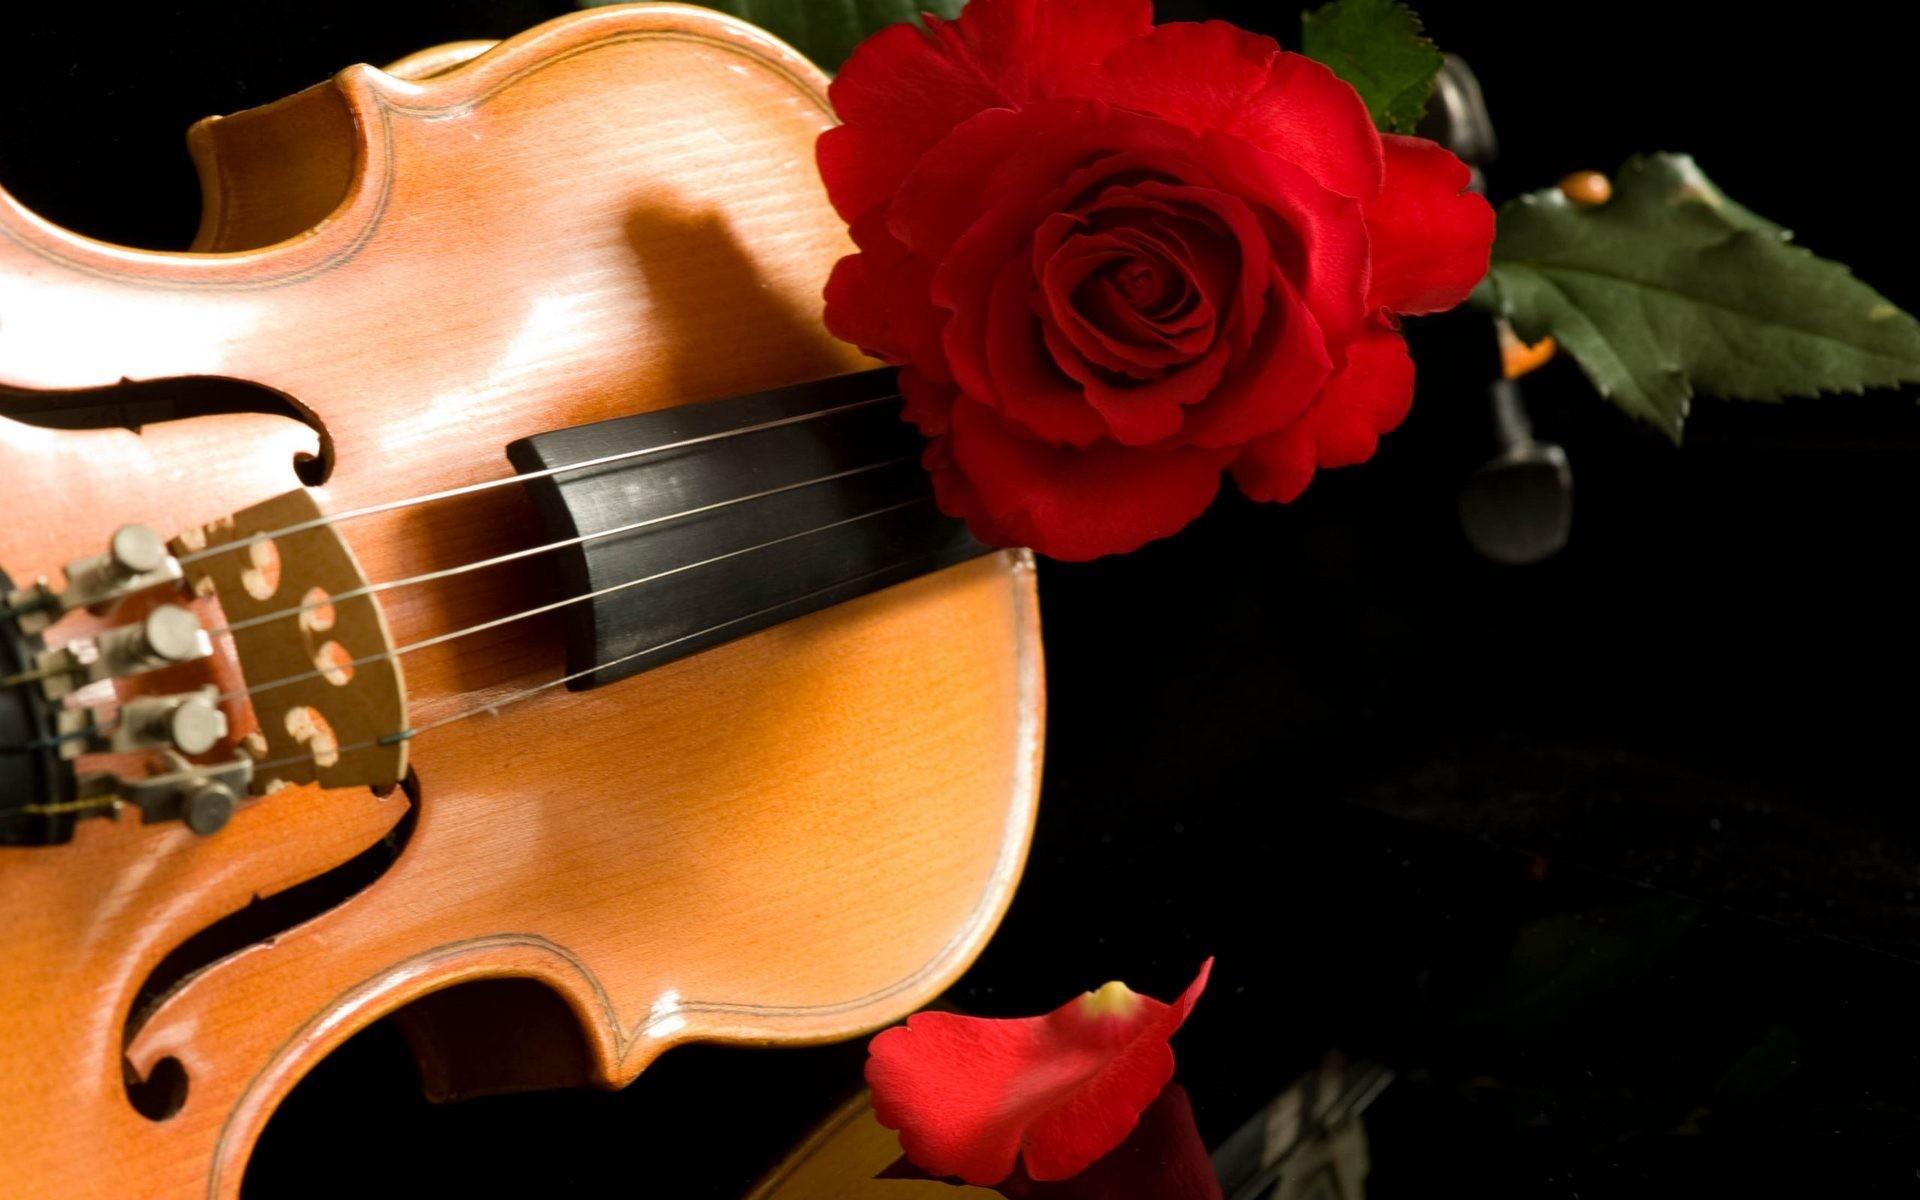 Red rose on a violin wallpaper, Red rose on a violin Photography HD desktop  wallpaper